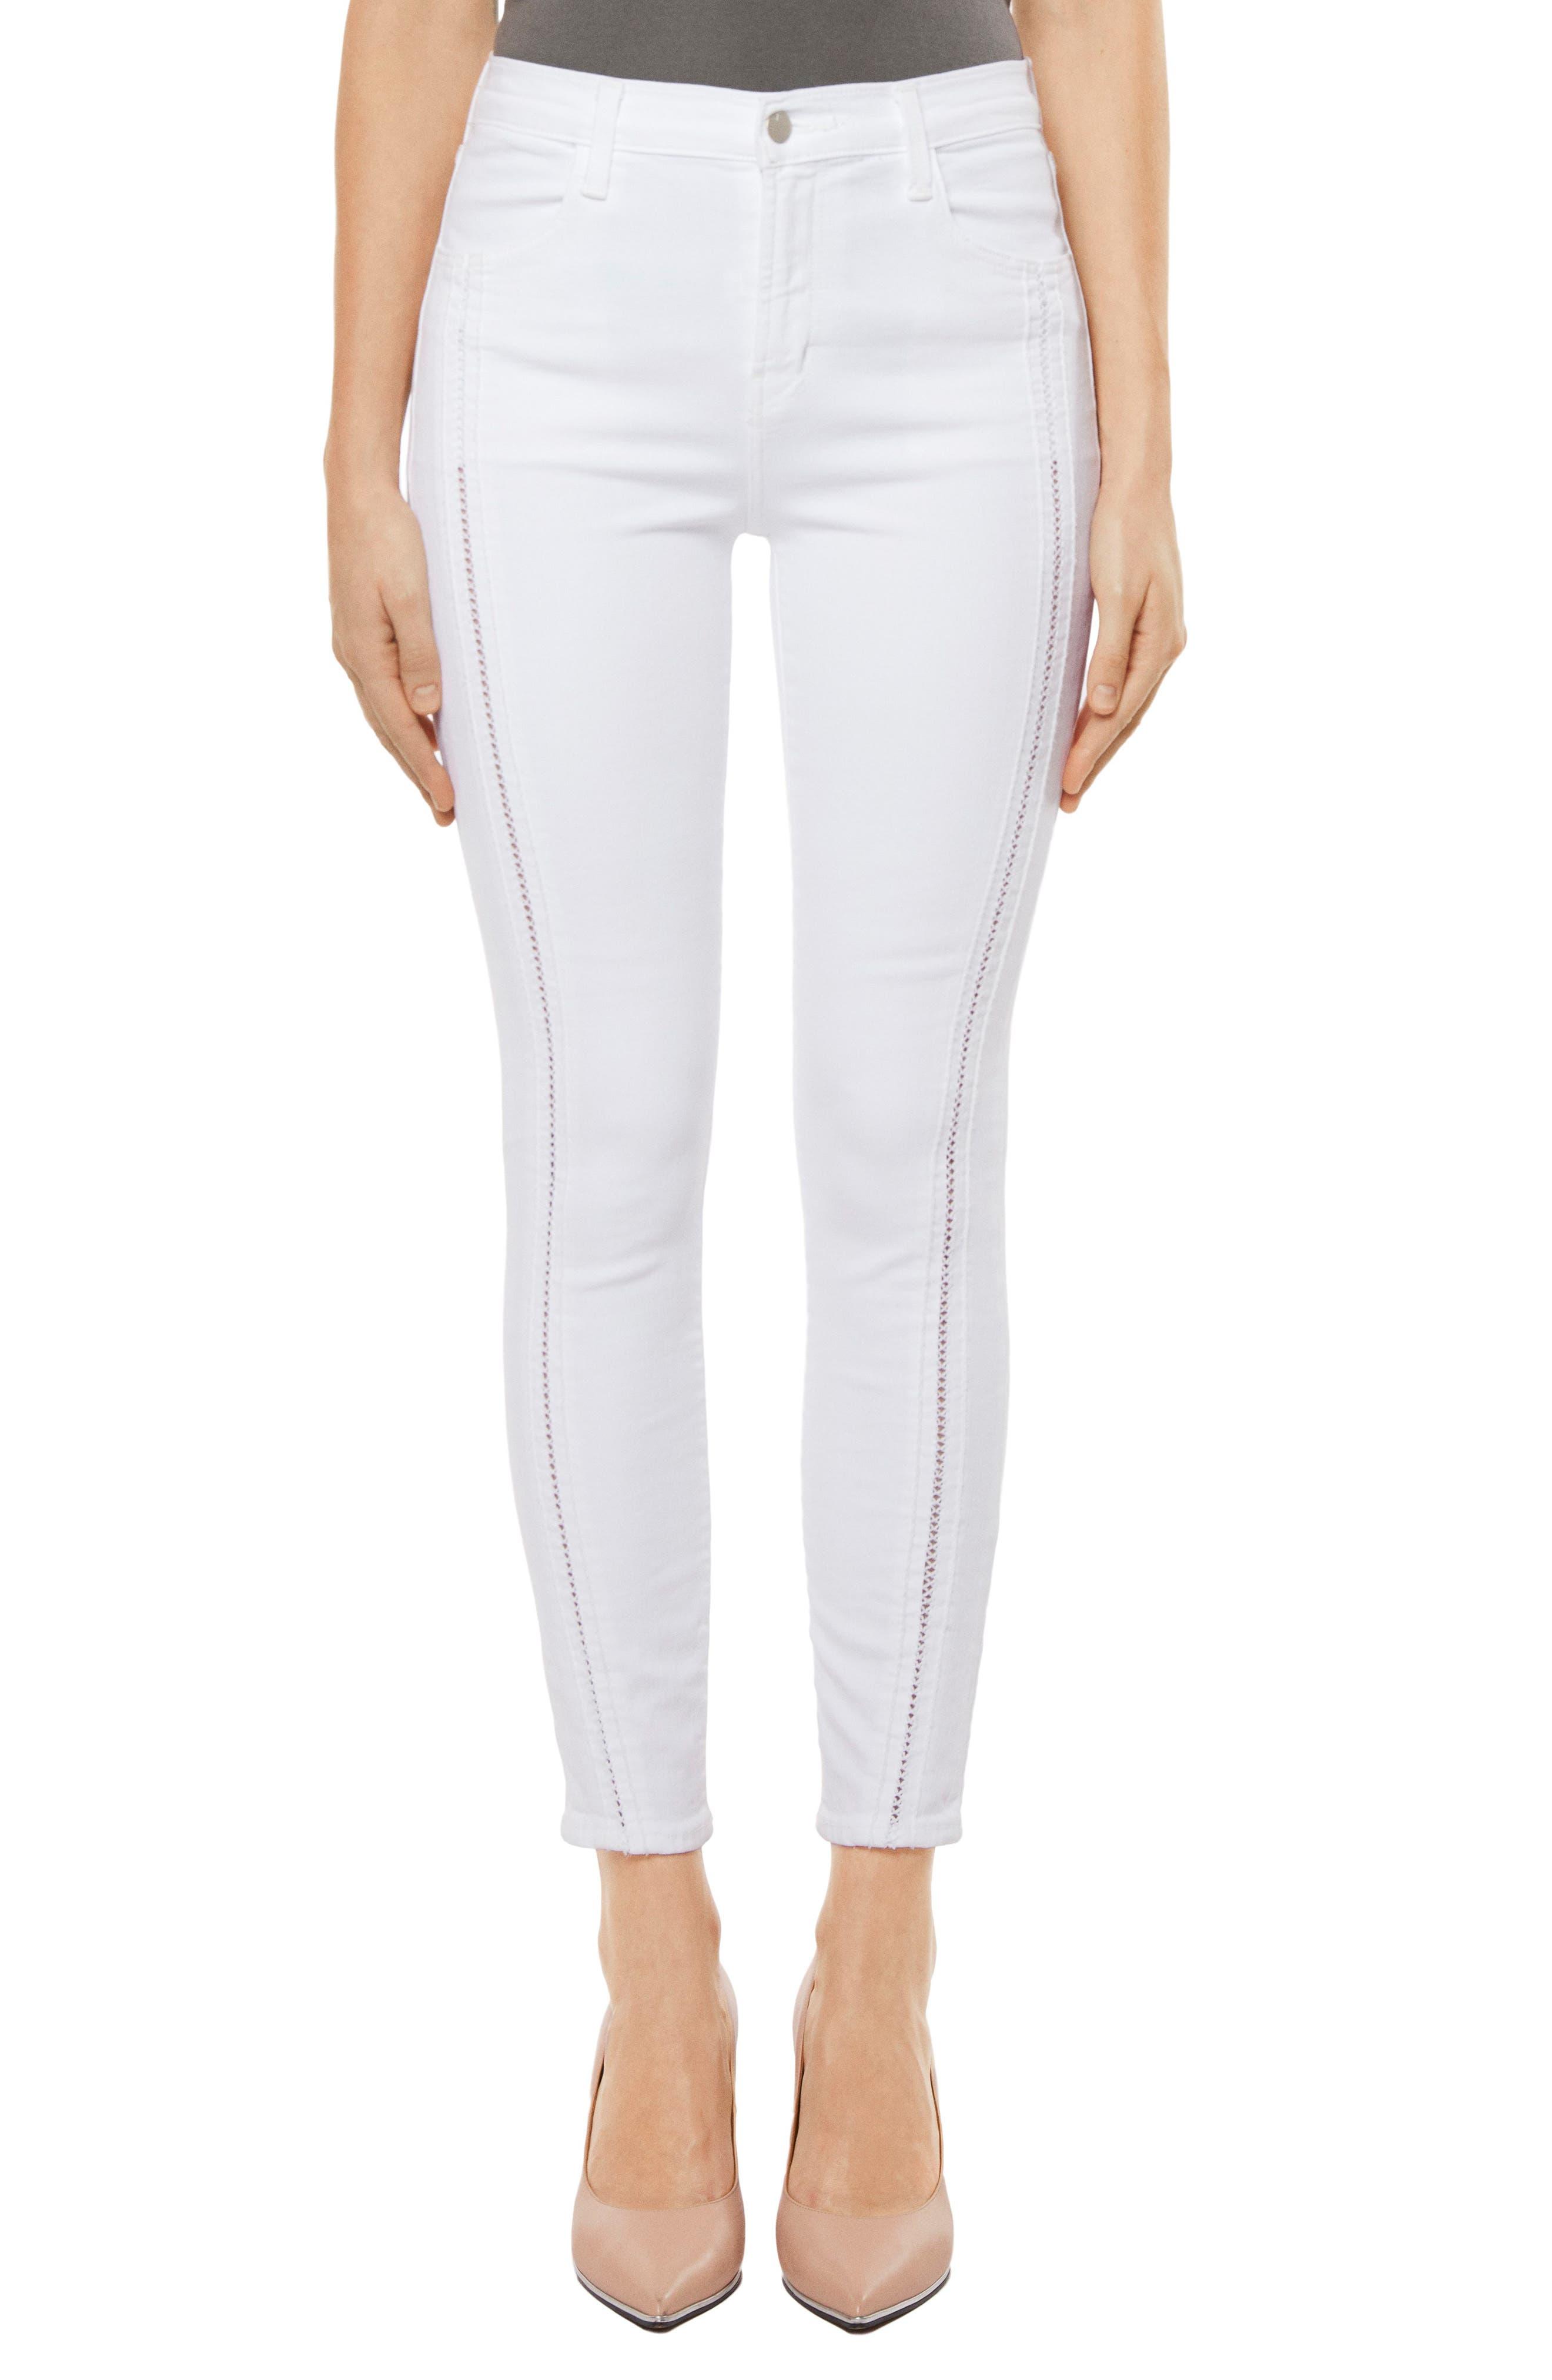 Alana High Waist Crop Skinny Jeans,                         Main,                         color, 160